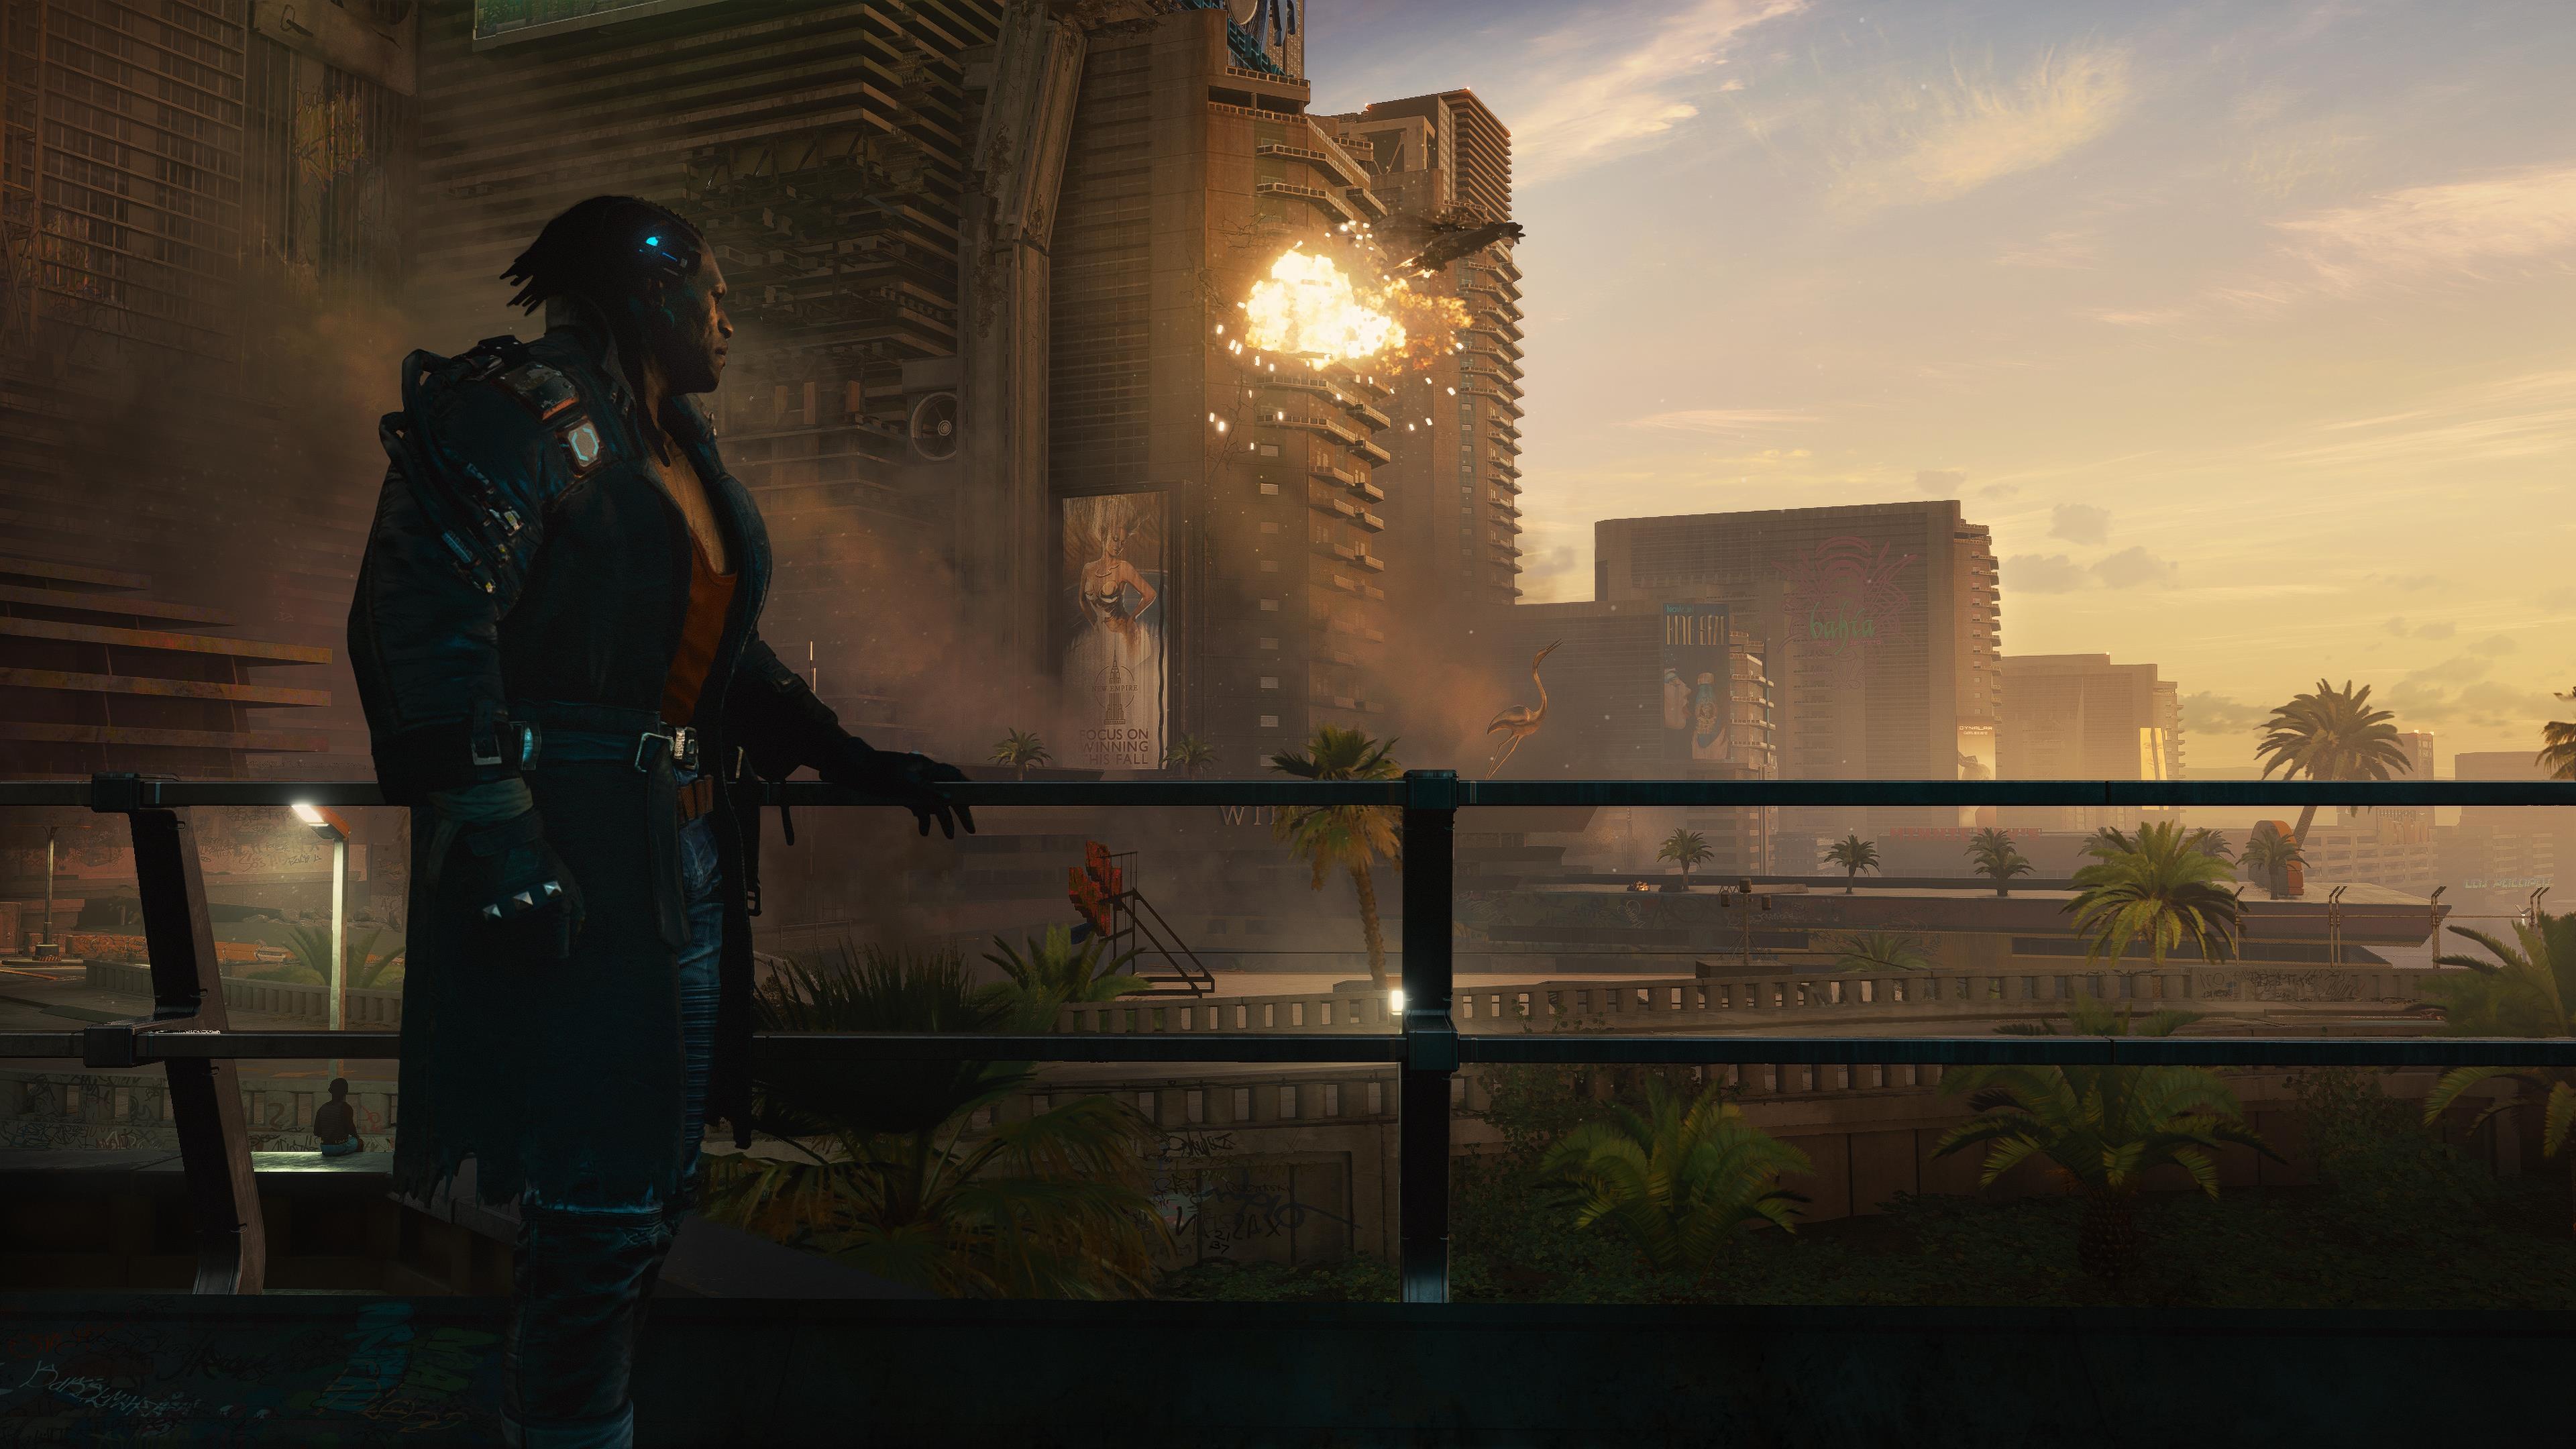 Фанаты взялись за дело: для Cyberpunk 2077 вышел мод, который добавляет 120 новых заданий